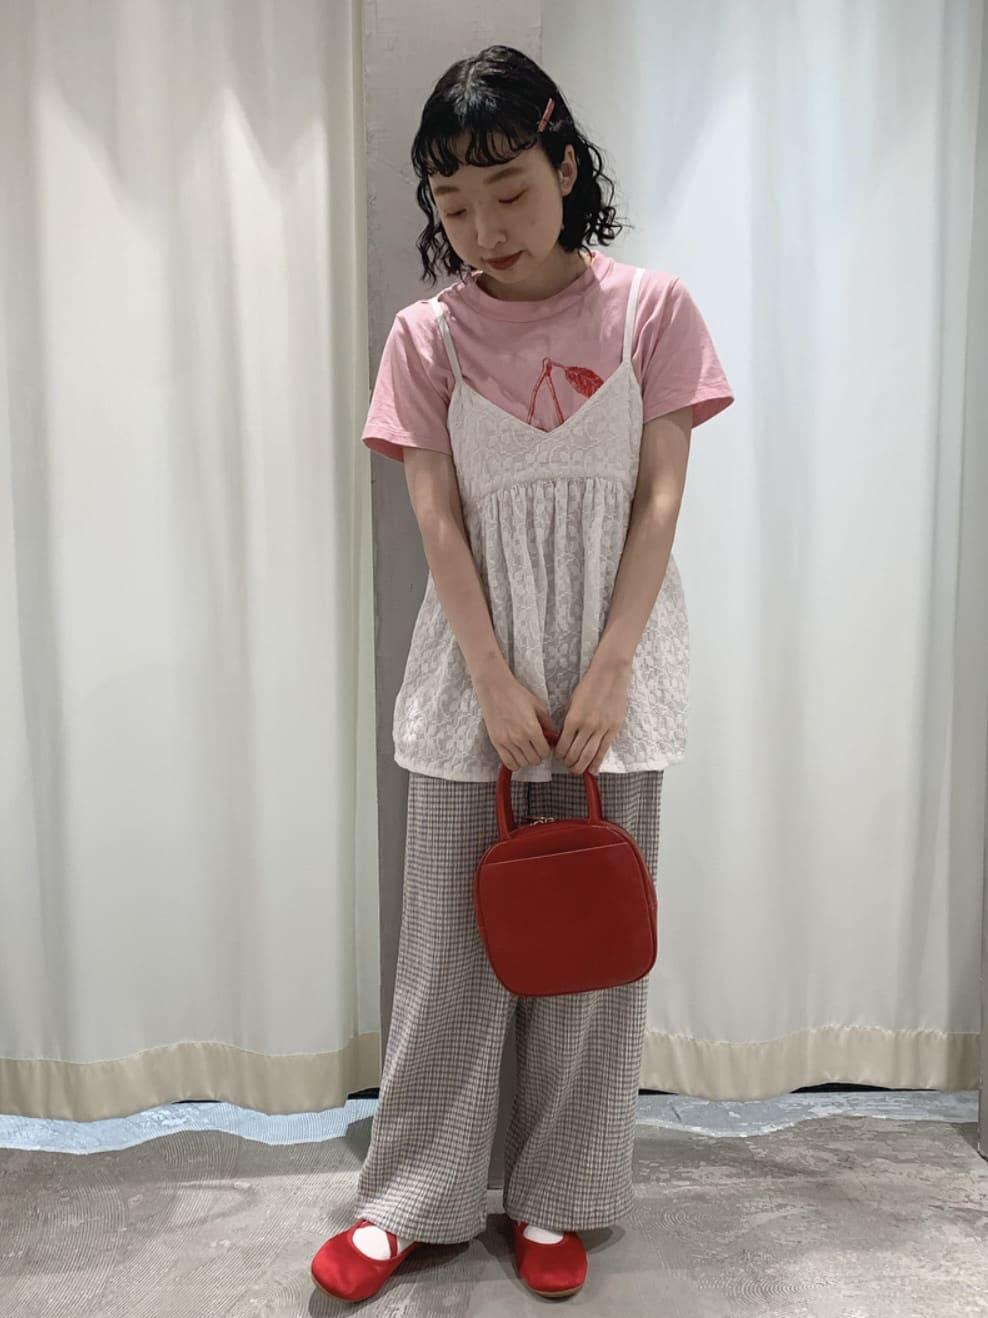 - CHILD WOMAN CHILD WOMAN , PAR ICI ルミネ横浜 身長:157cm 2021.08.13